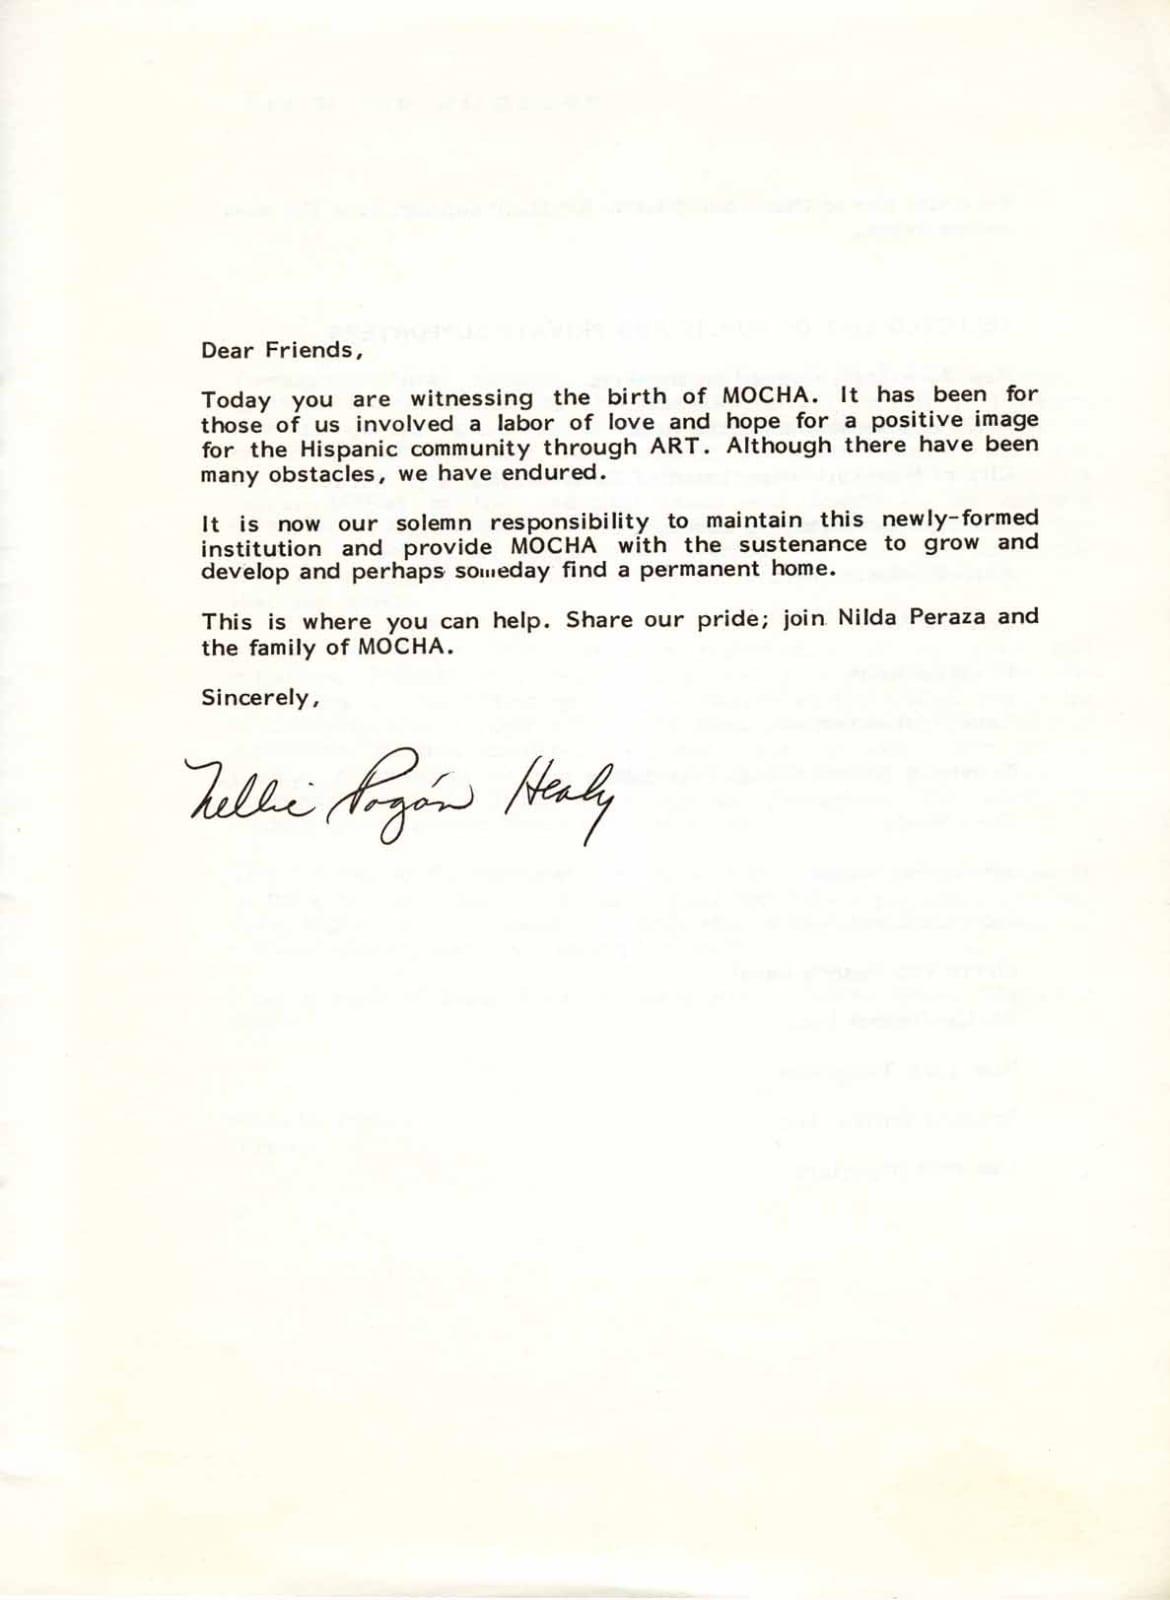 Musuem of Contemporary Hispanic Art (MoCHA) Inaguration Letter, Letter from Nellie Pogón Healy, 1985